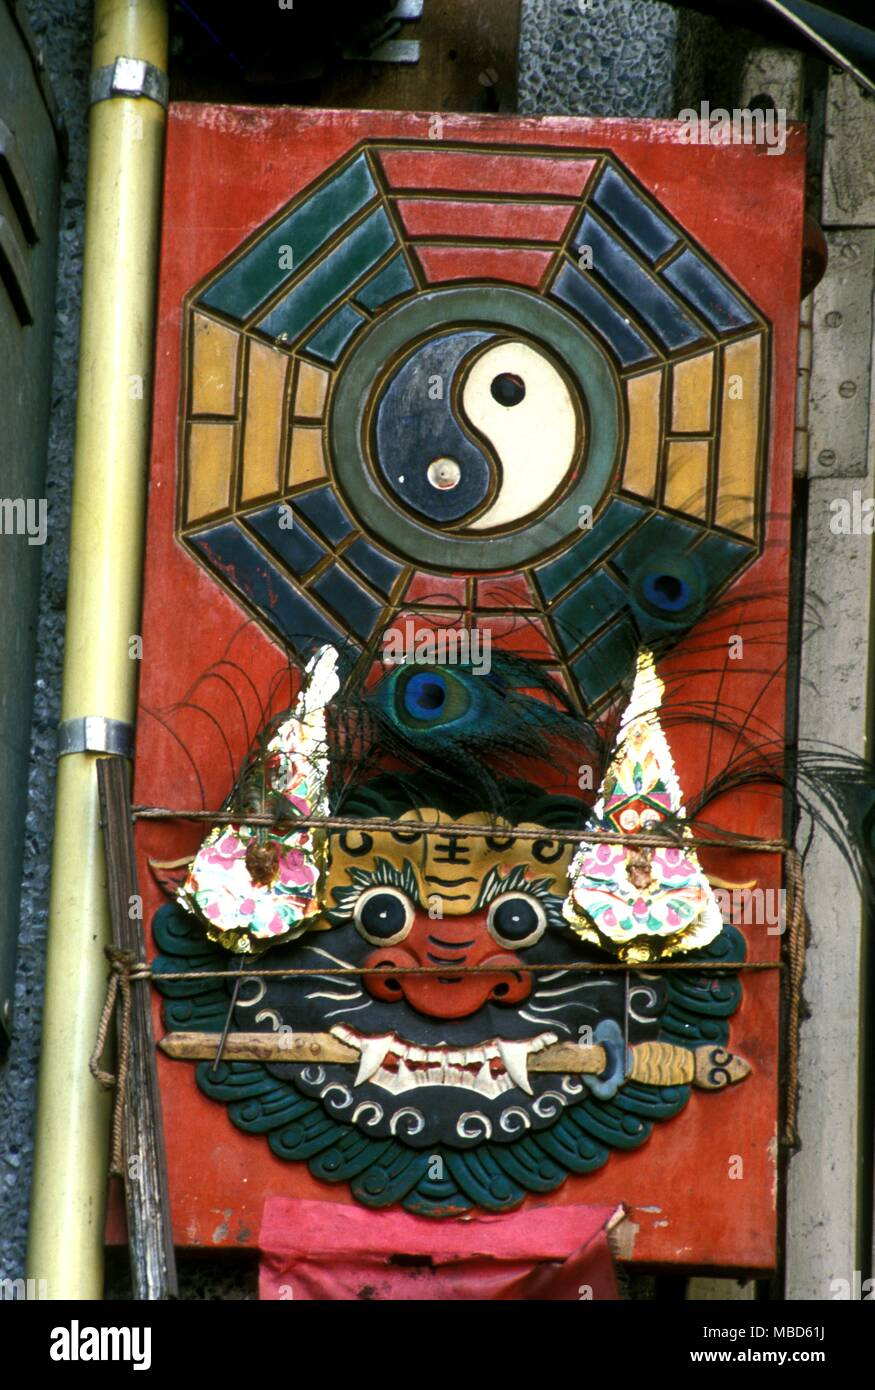 Chinese Symbol Tai Chi Stock Photo 179155022 Alamy